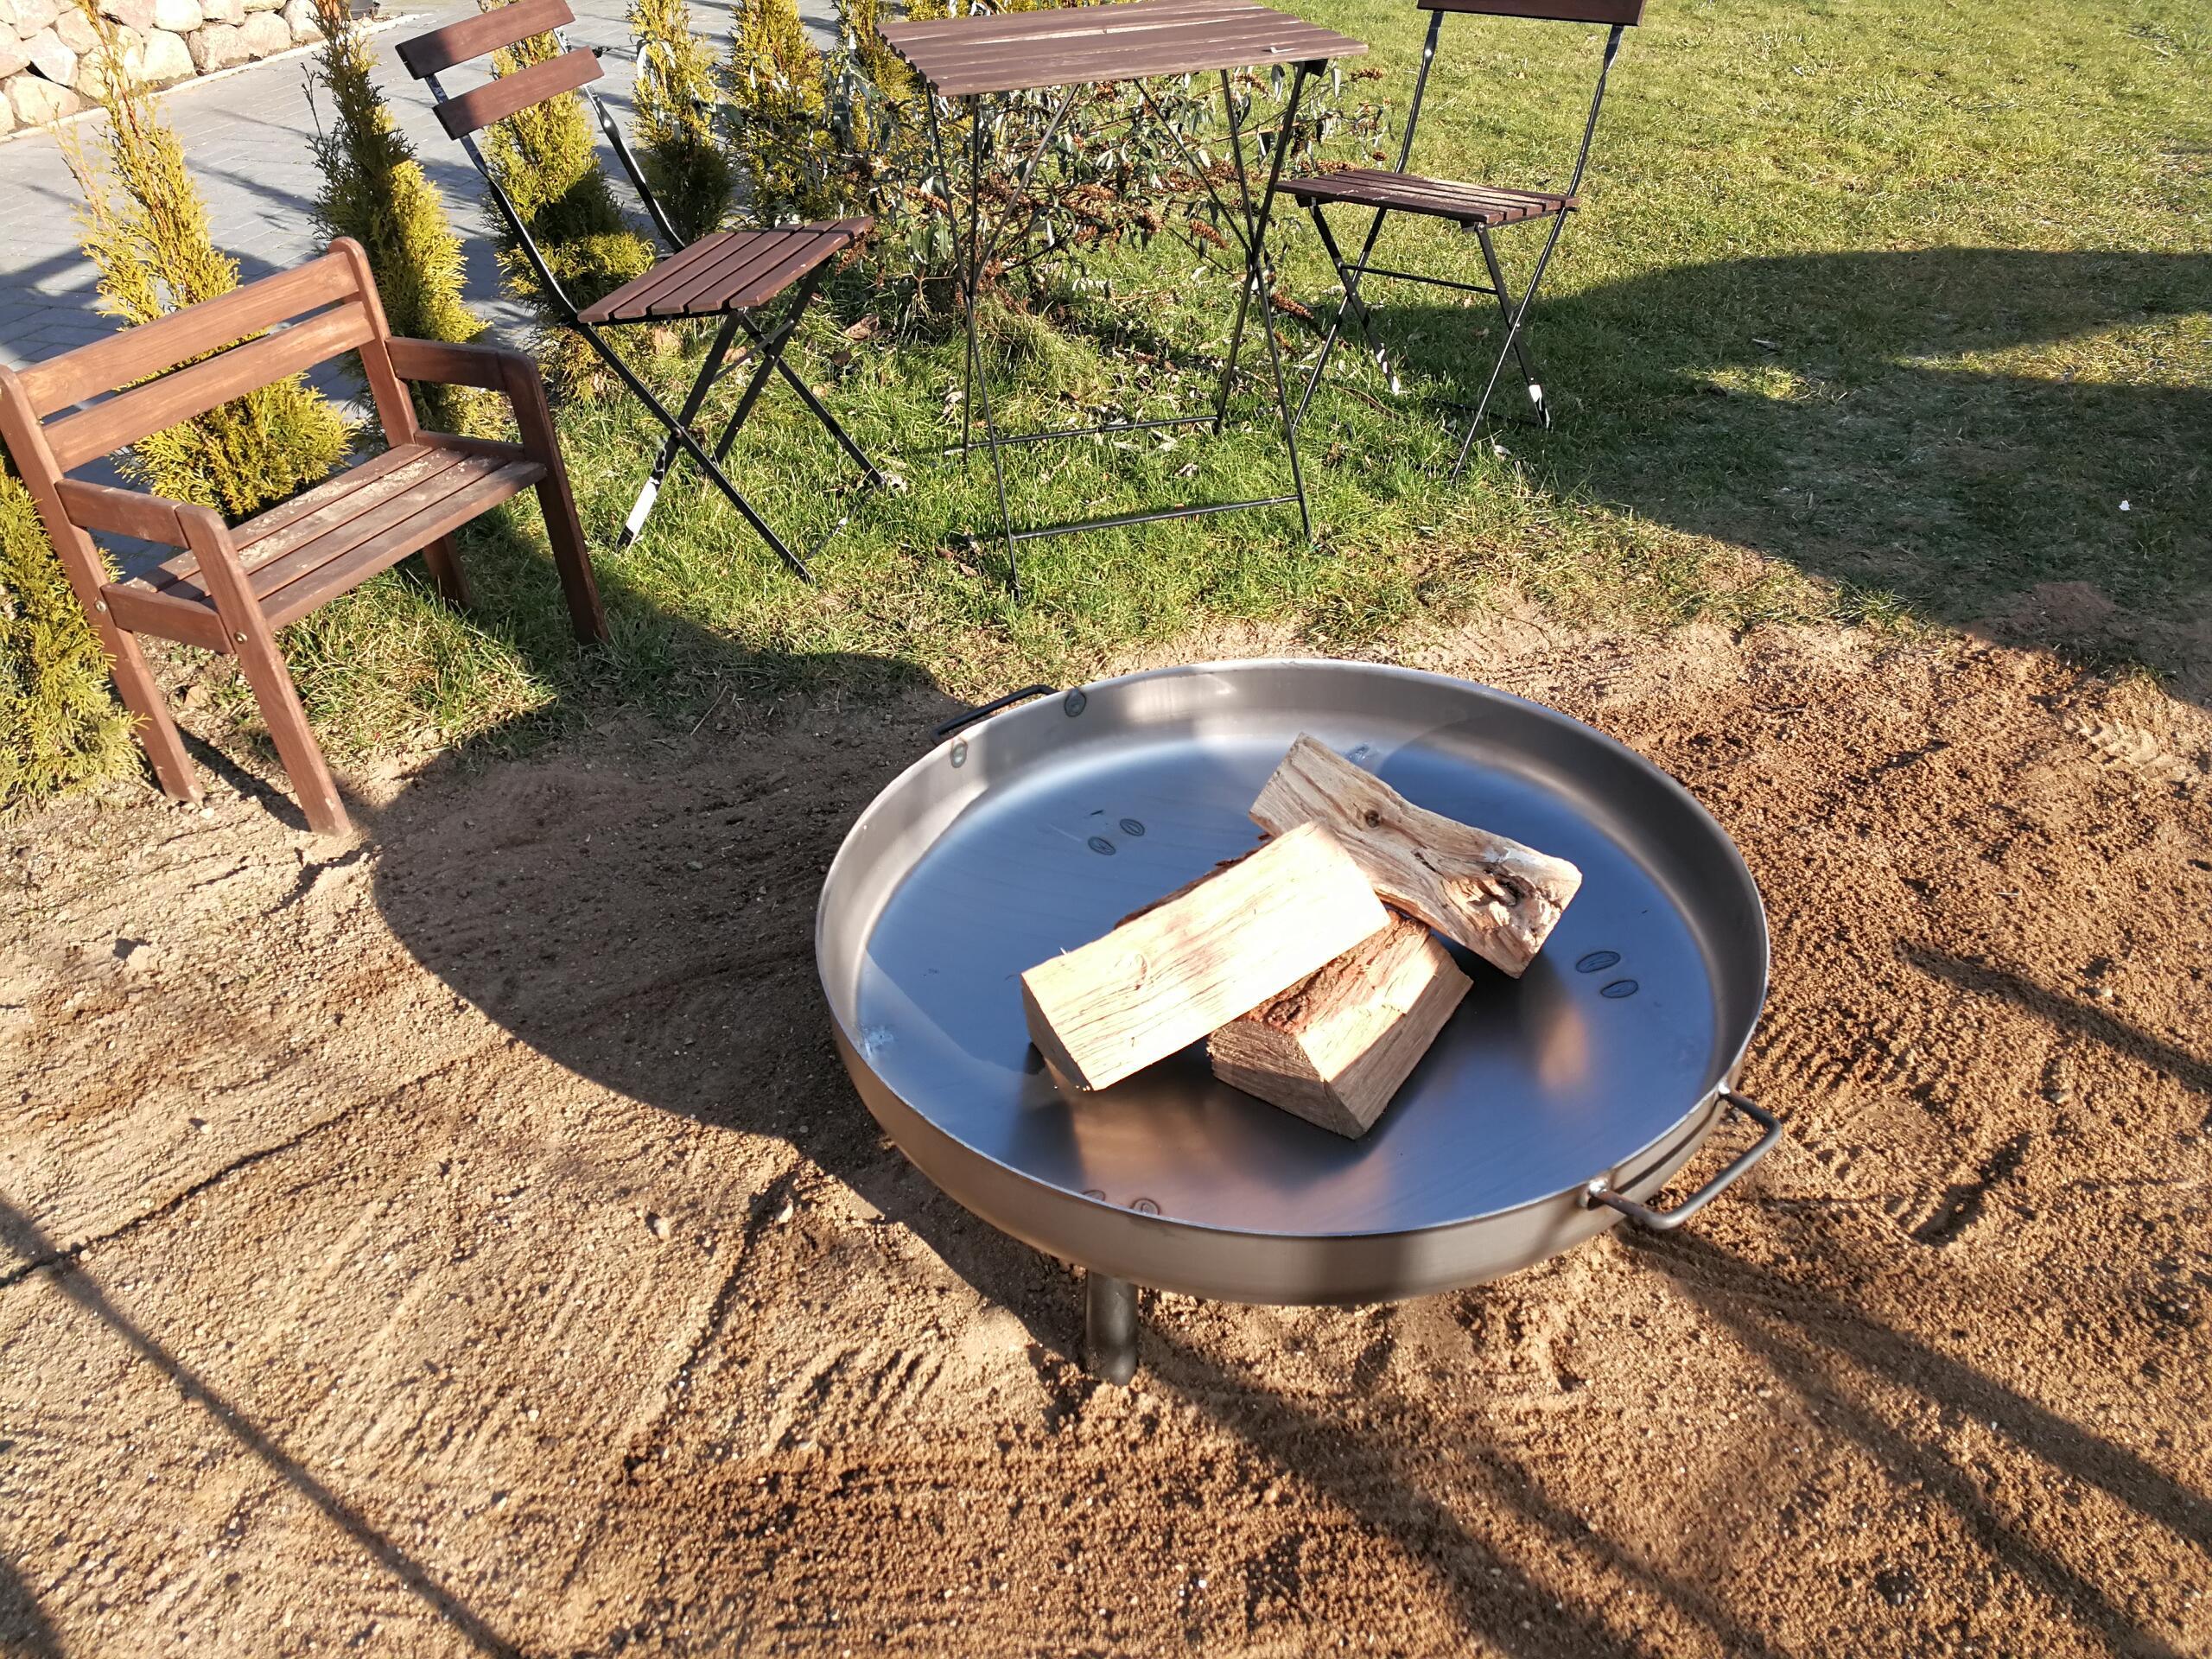 feuerschalen archive outdoor kochen l beck. Black Bedroom Furniture Sets. Home Design Ideas